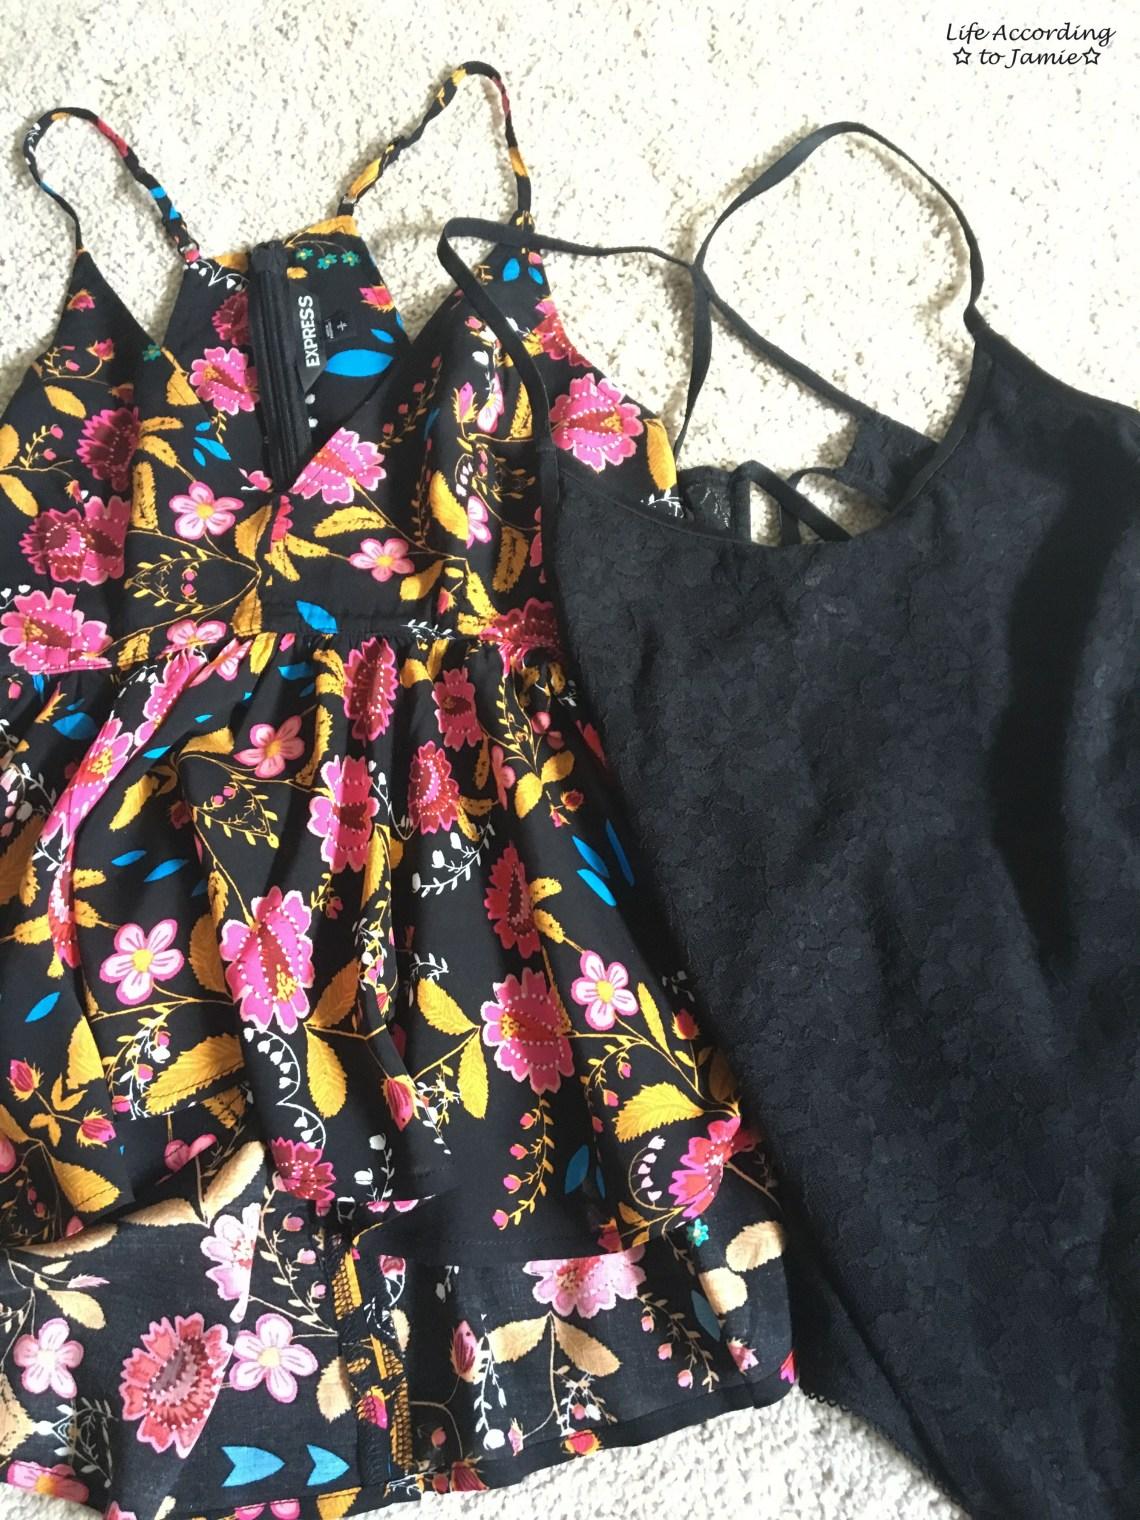 Floral Babydoll Cami + Lace Bodysuit